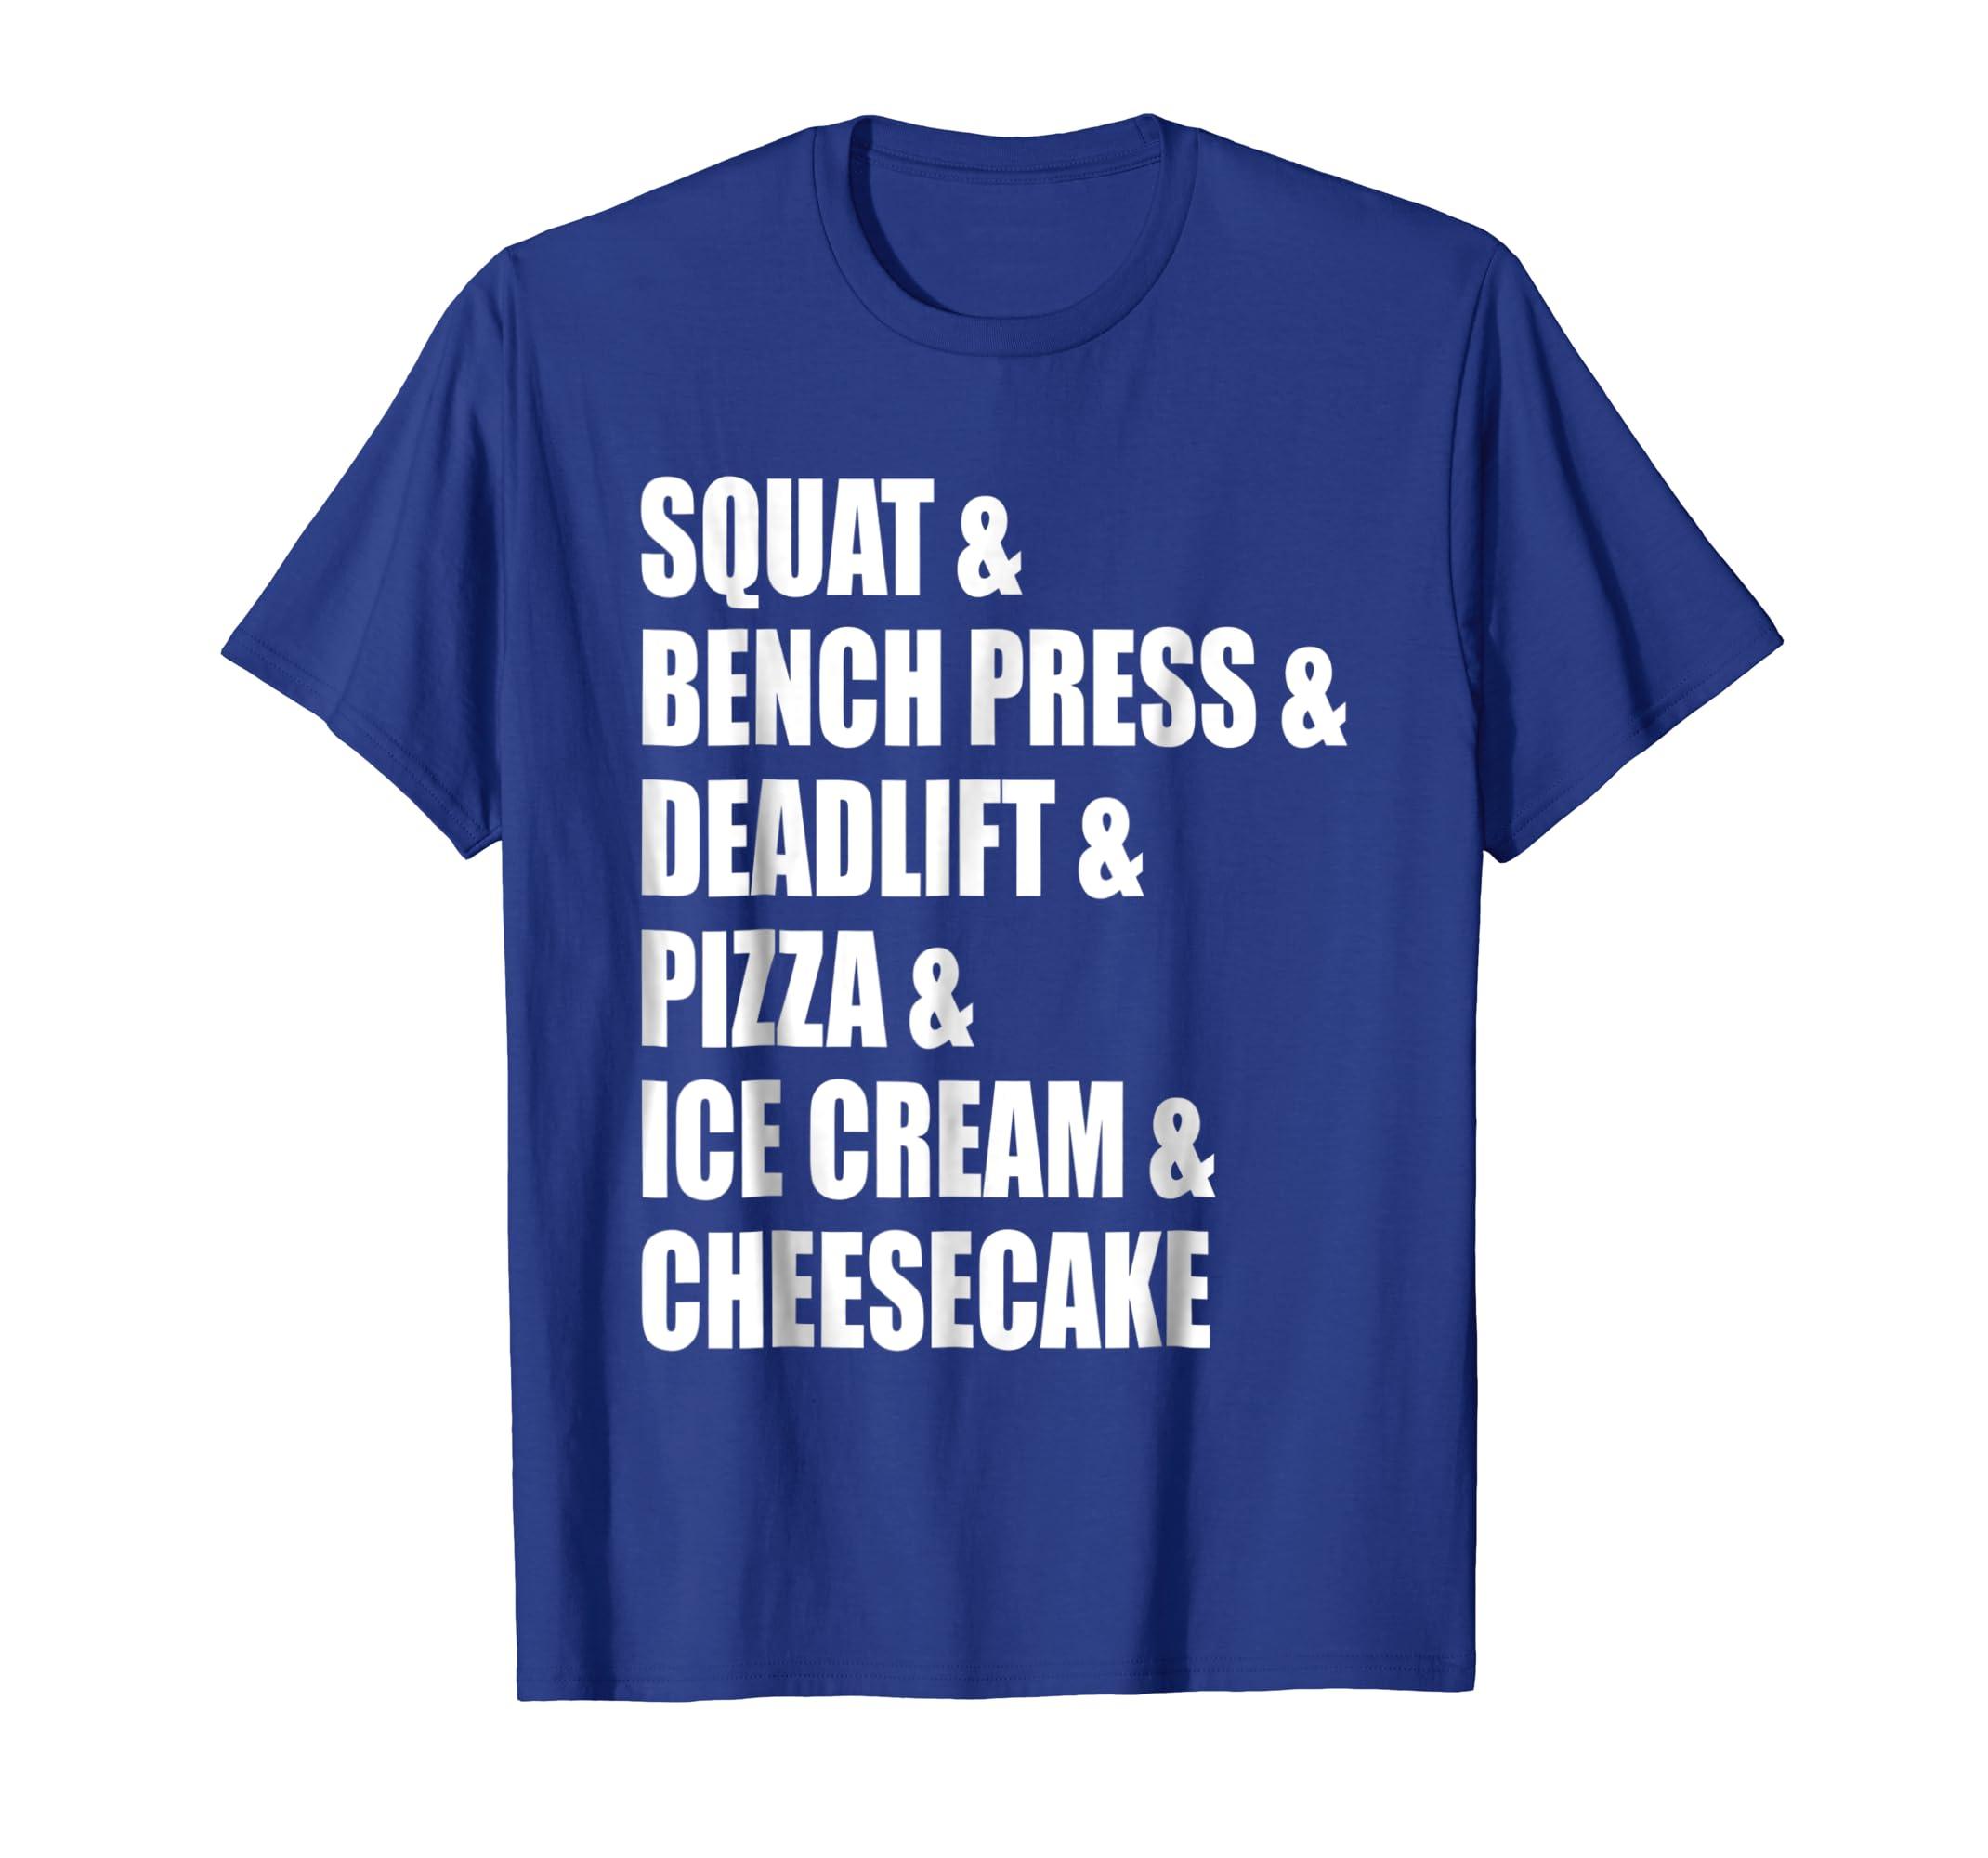 64239b4e6b Amazon.com: Squat, Bench Press, Deadlift, Pizza, Ice Cream, Cake - Tee:  Clothing